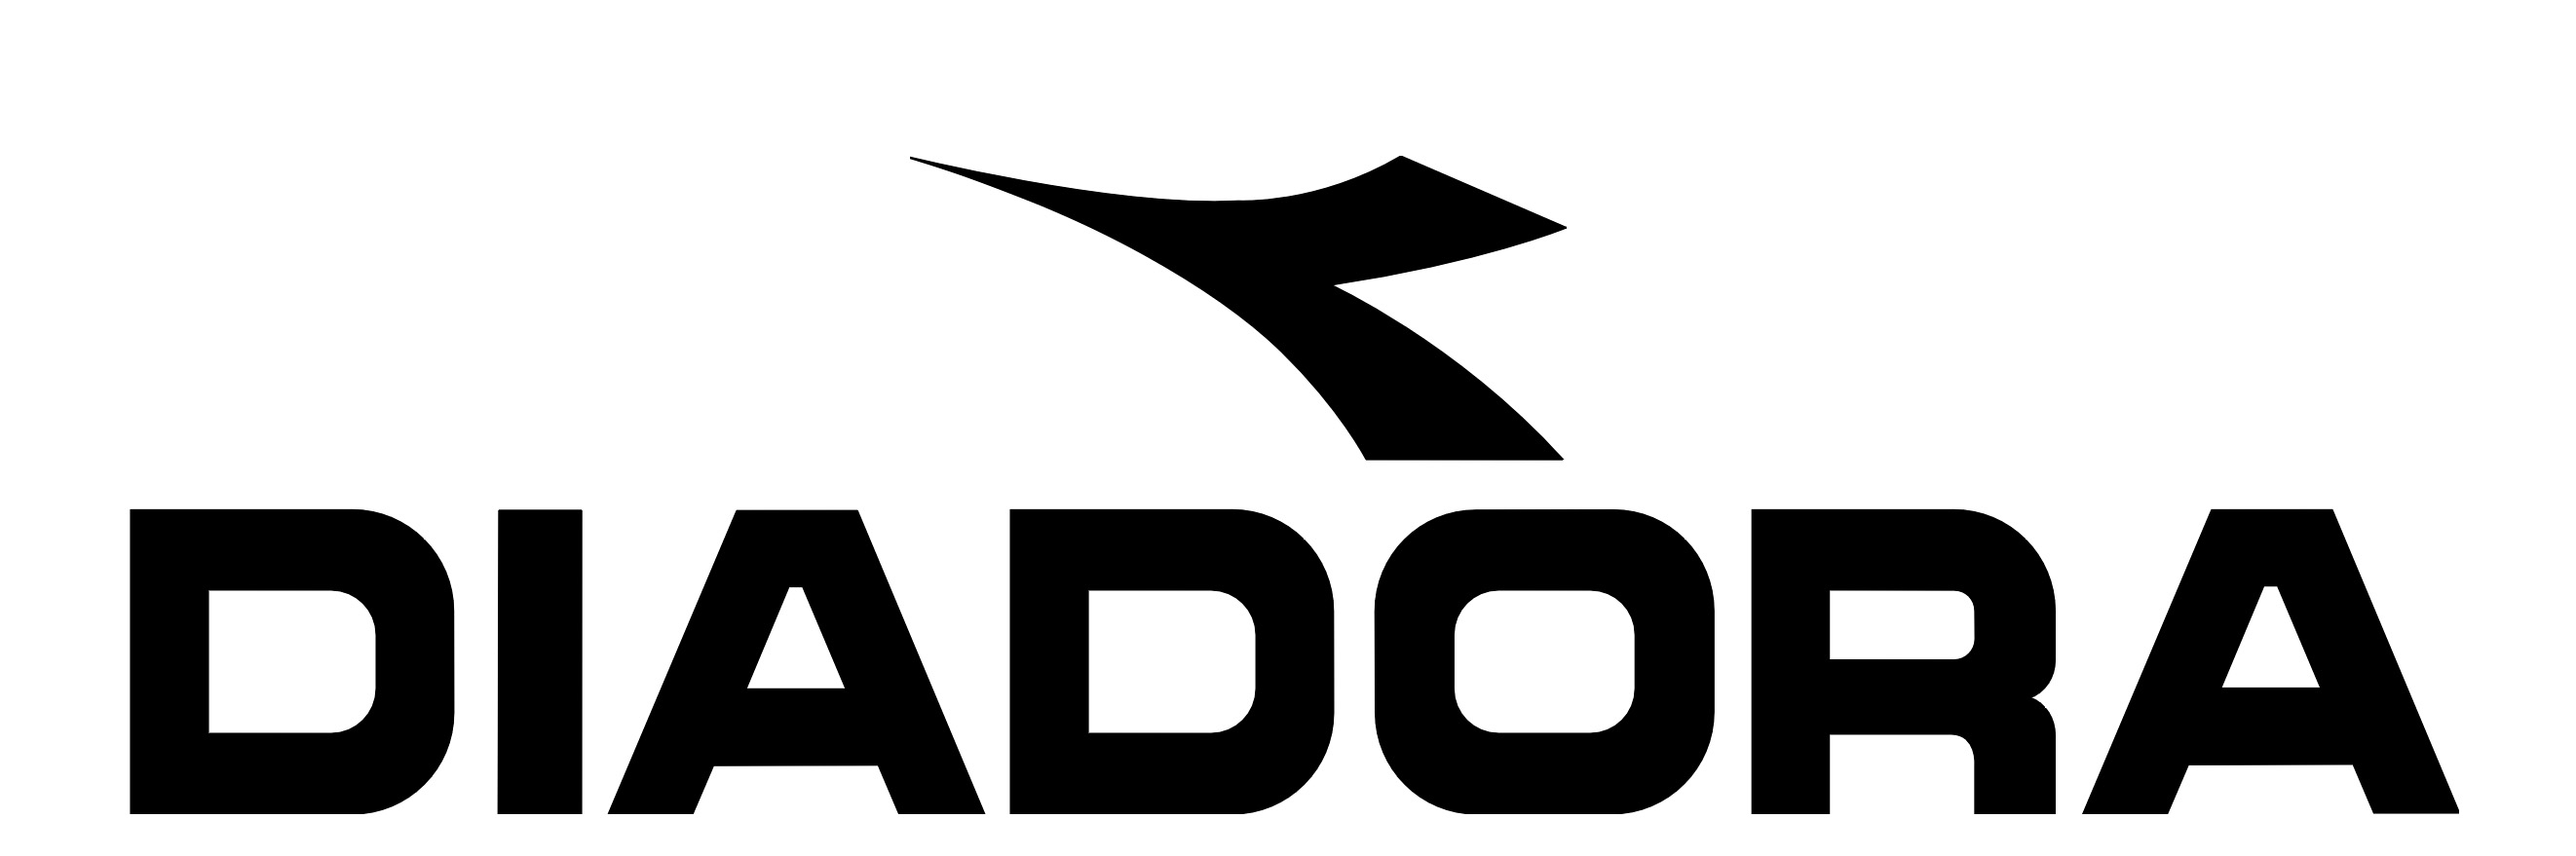 Where Are Diadora Shoes Manufactured